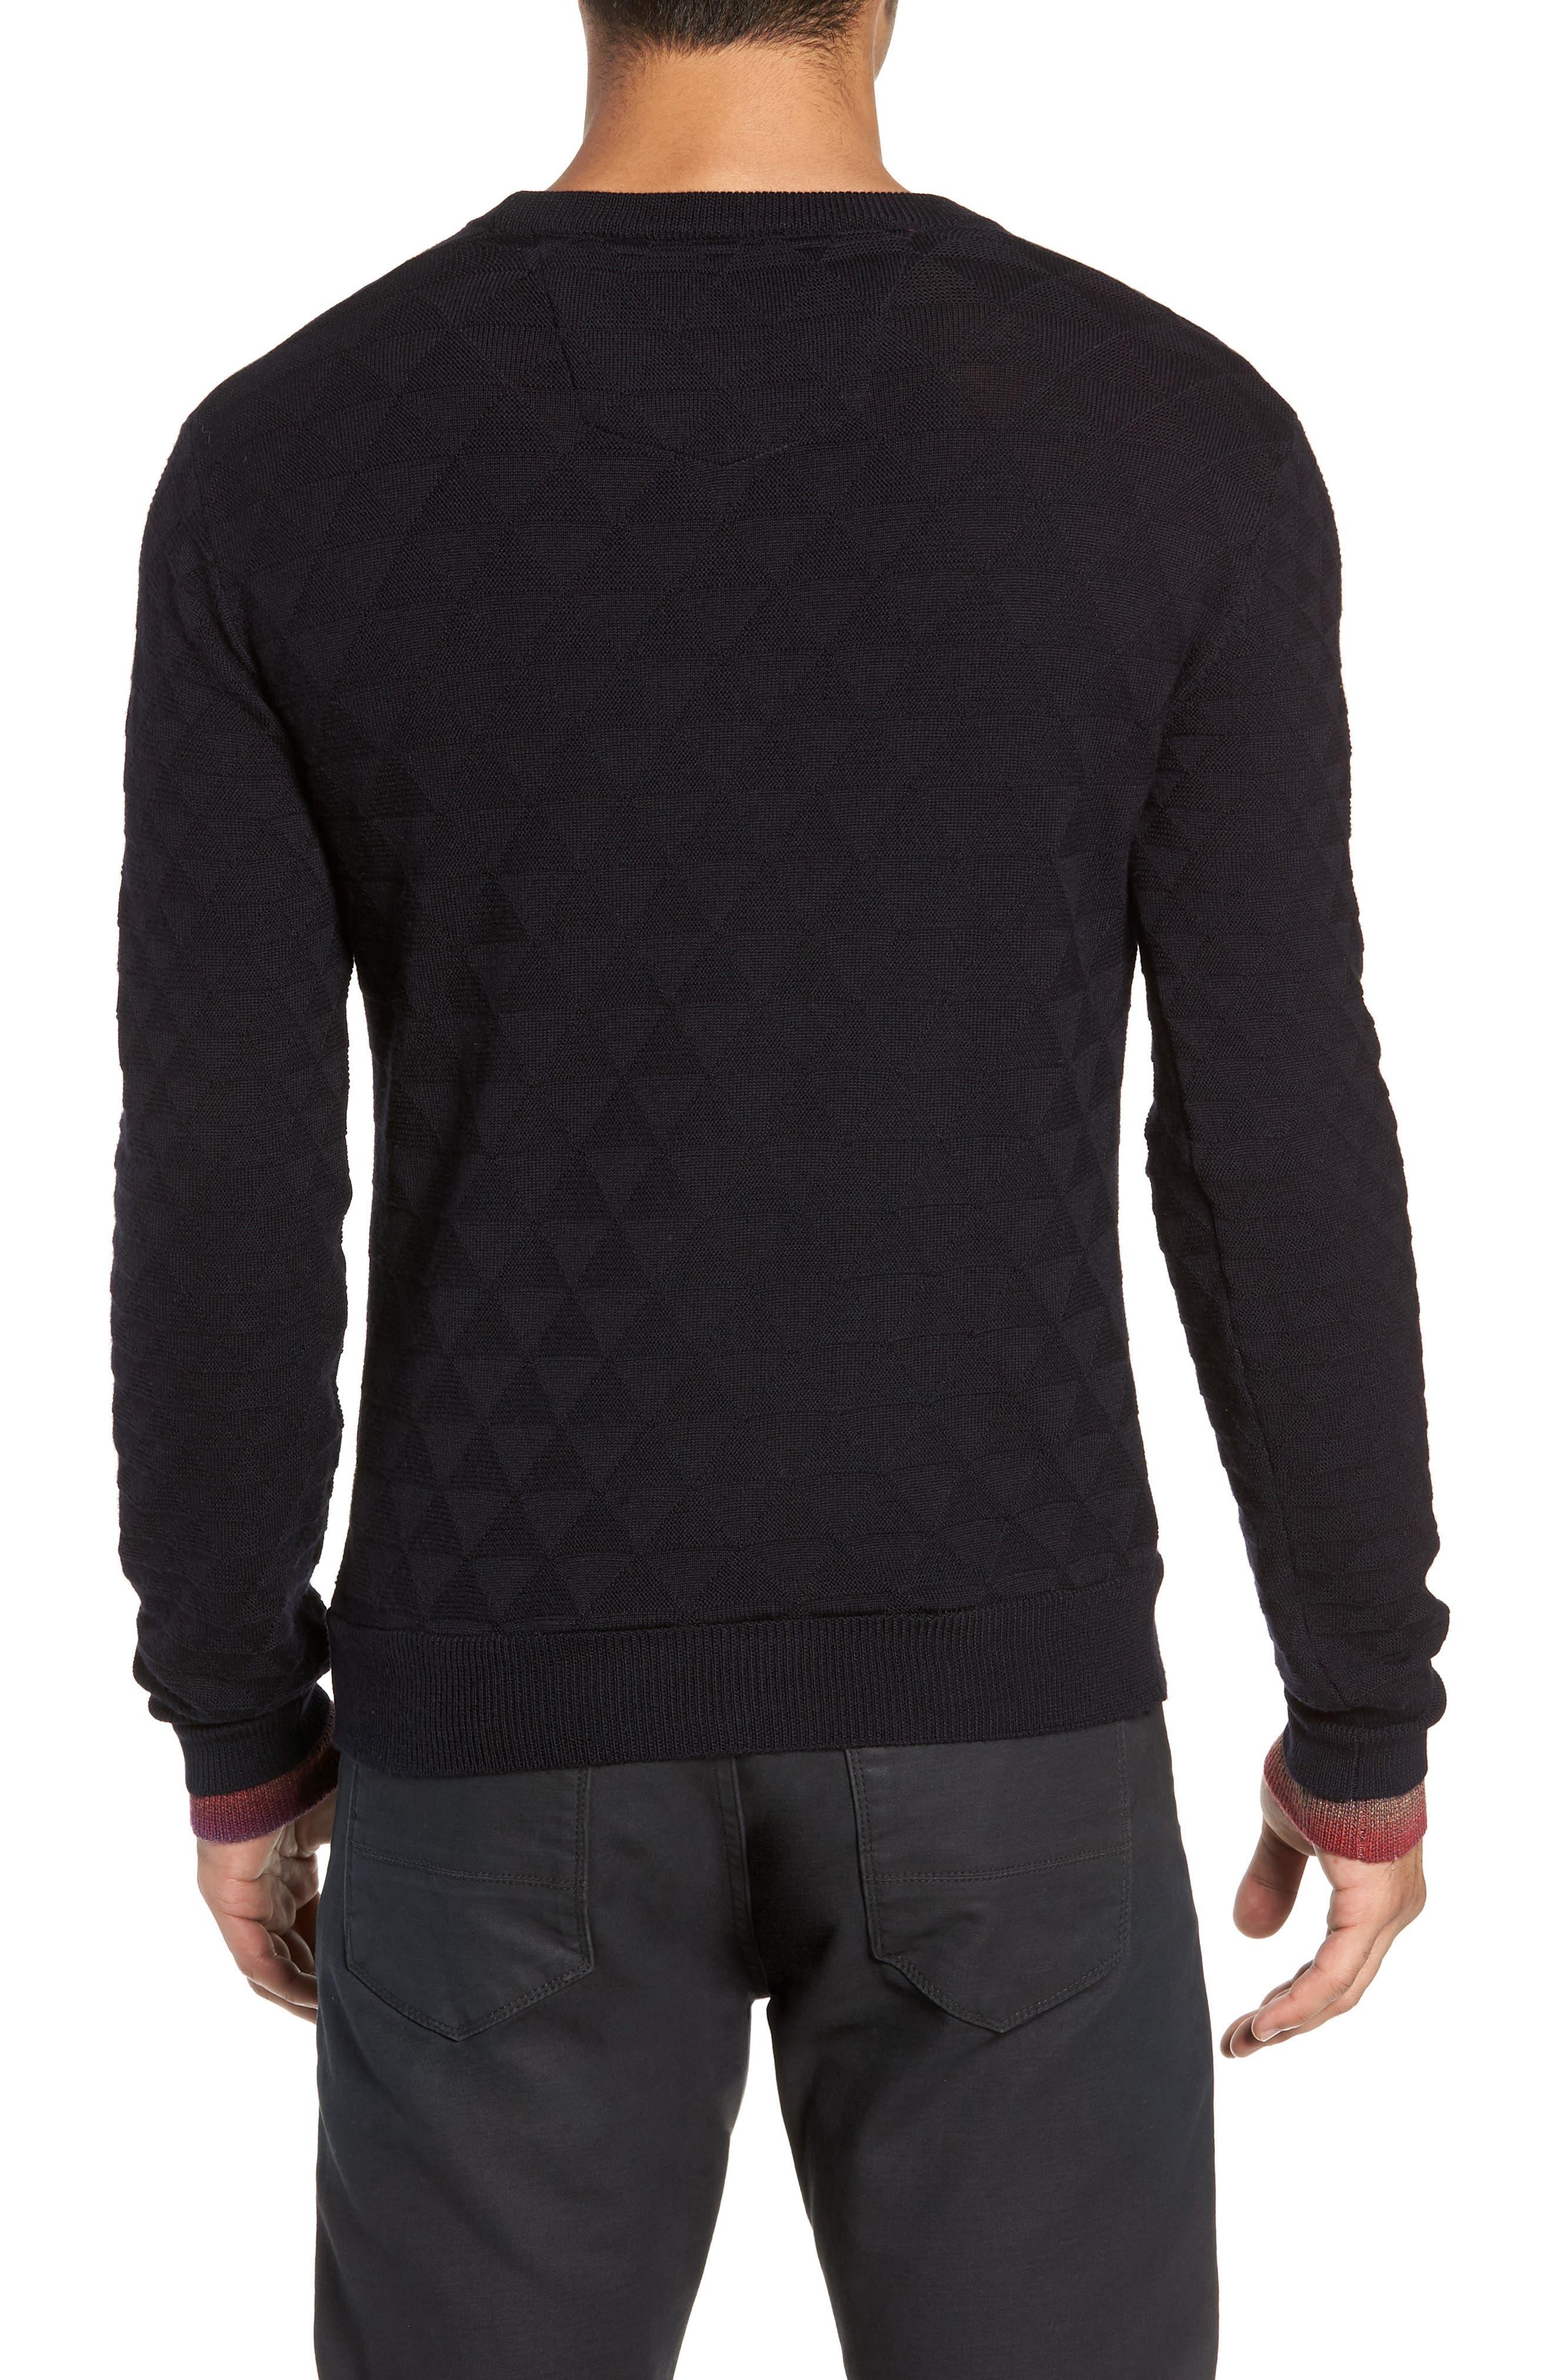 Blackburn Classic Fit Sweater,                             Alternate thumbnail 2, color,                             BLACK